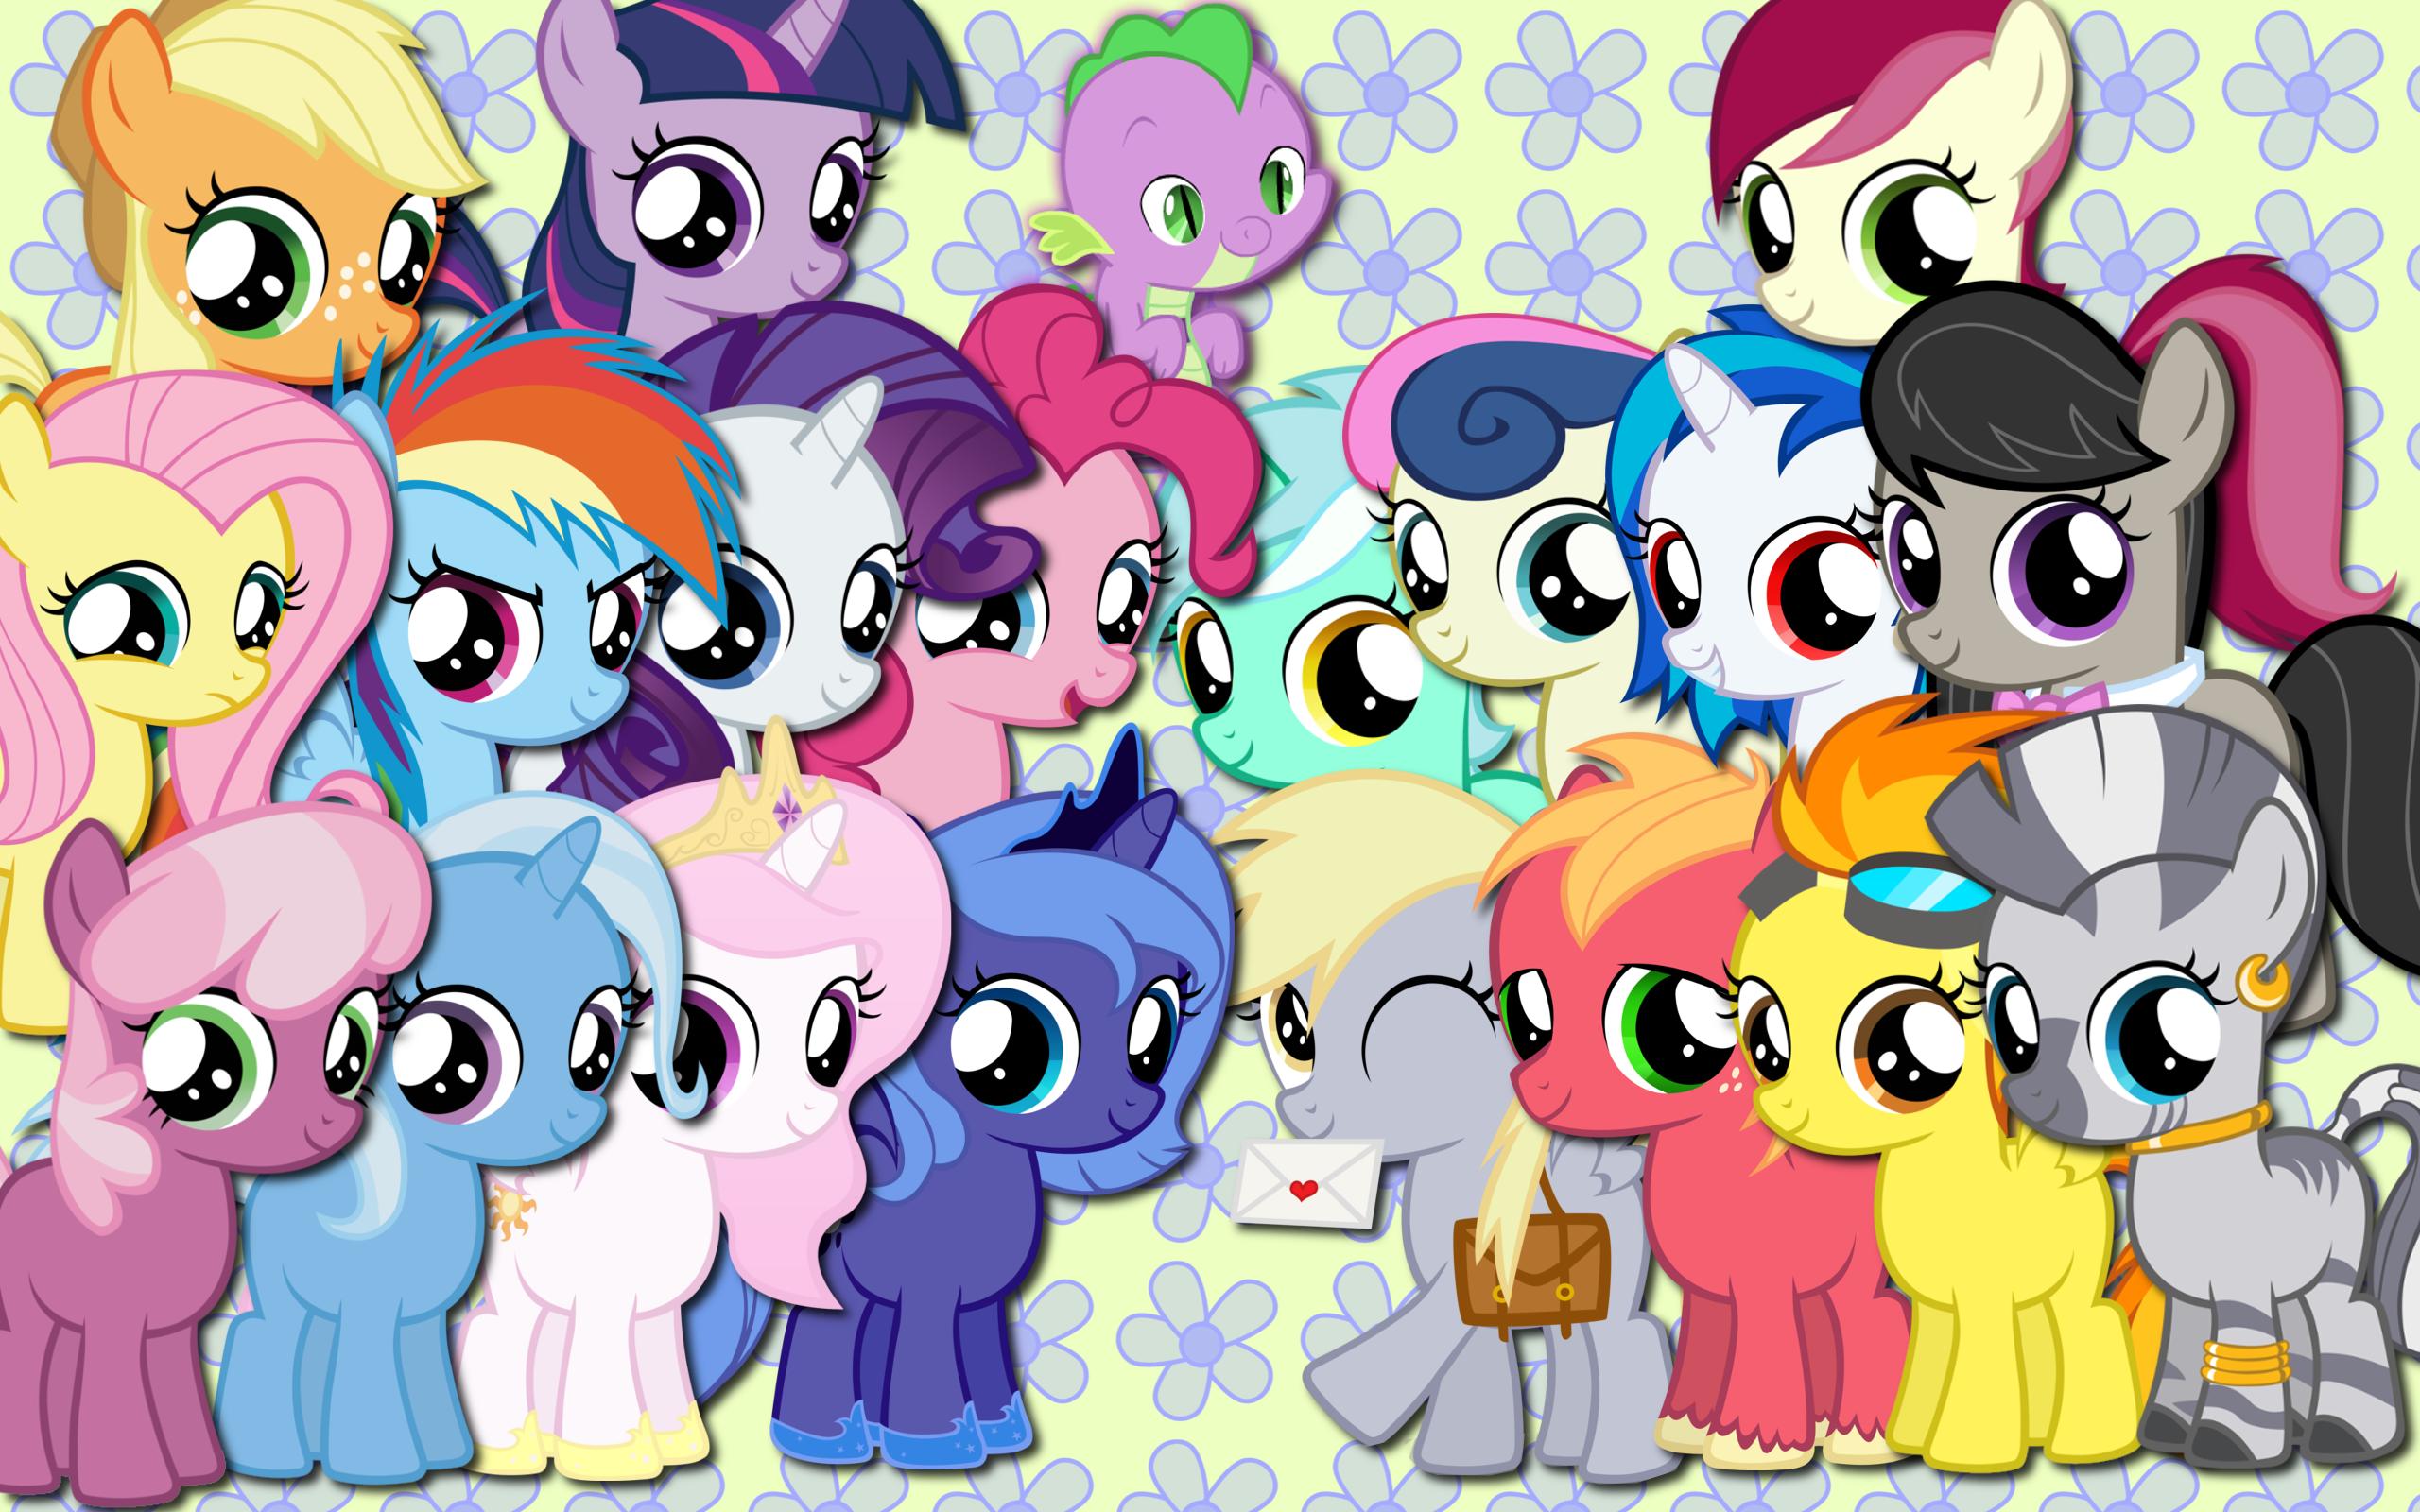 Foals are magic wallpaper by AliceHumanSacrifice0, AtomicGreymon, binaryNinj4, Blackm3sh, MoongazePonies and YooMe